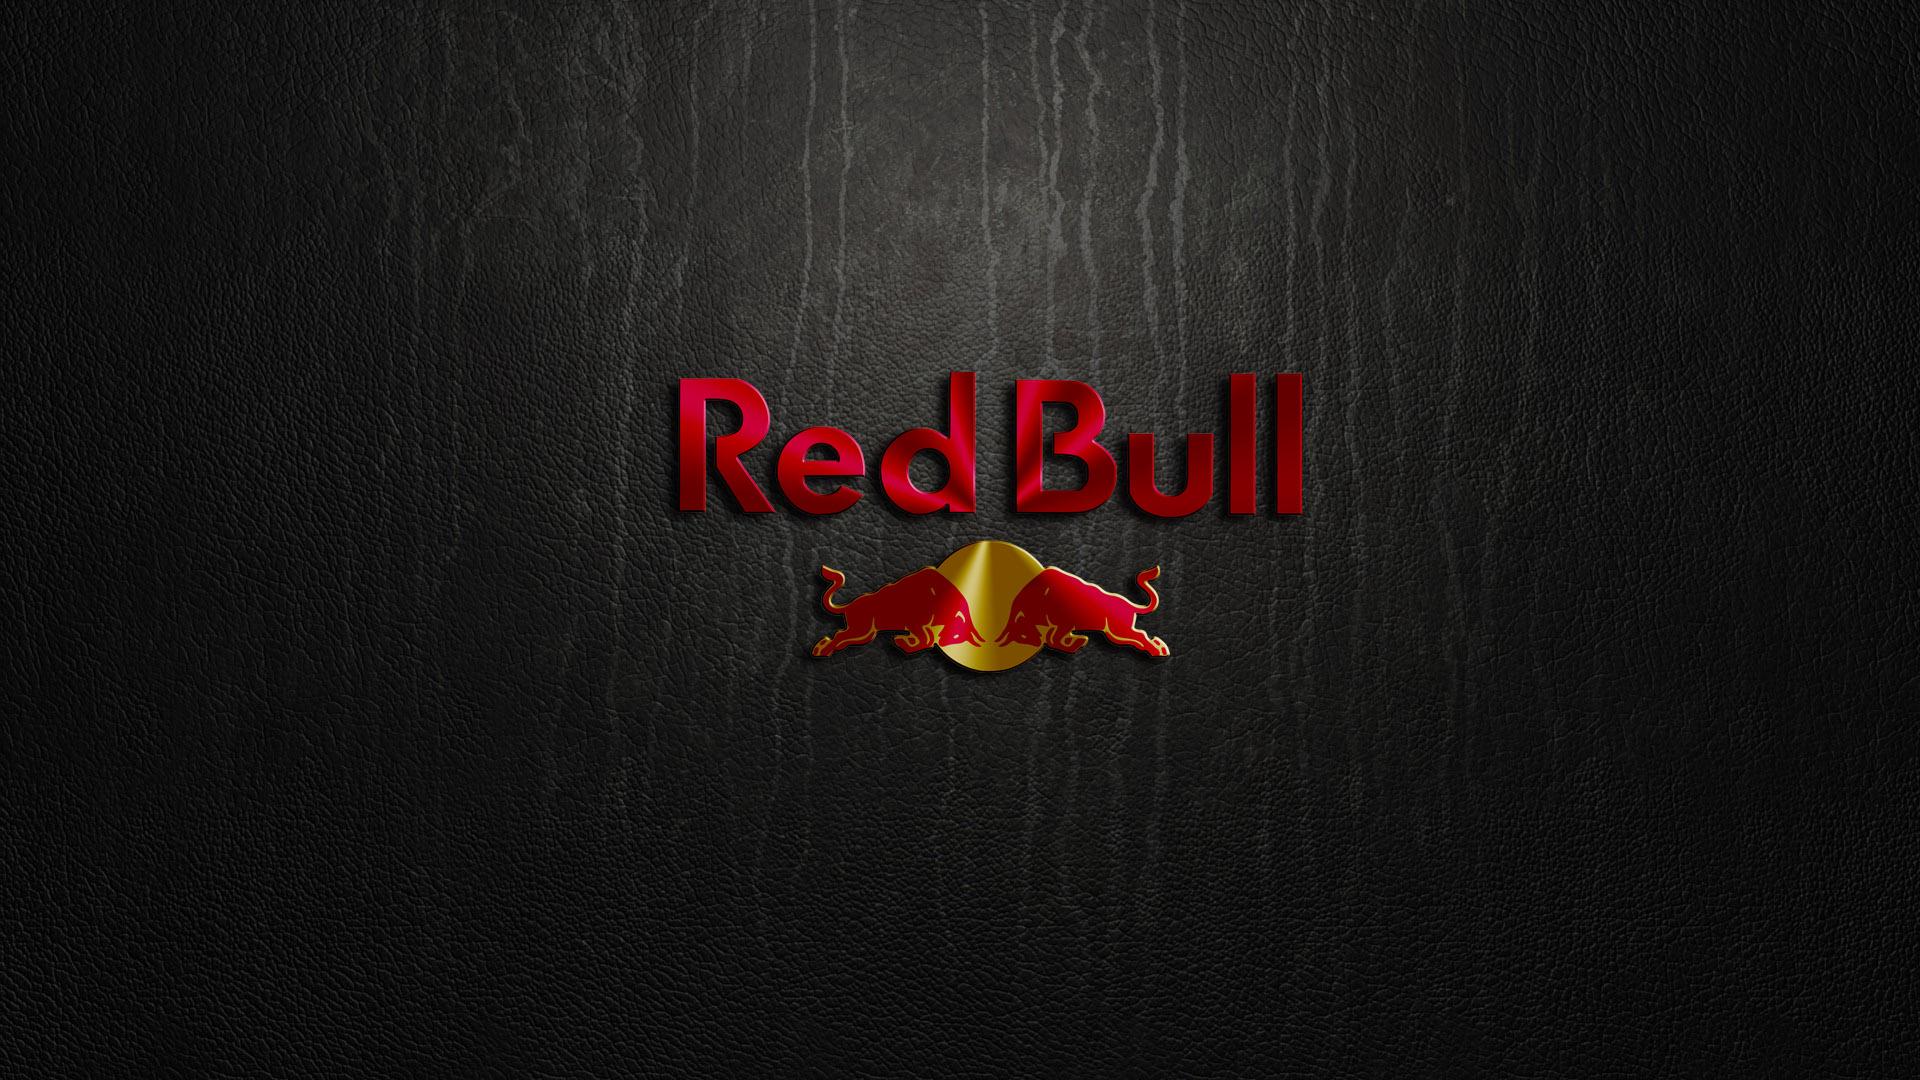 Red Bull Wallpaper Black Red Bull Wallpaper 4k 878507 Hd Wallpaper Backgrounds Download